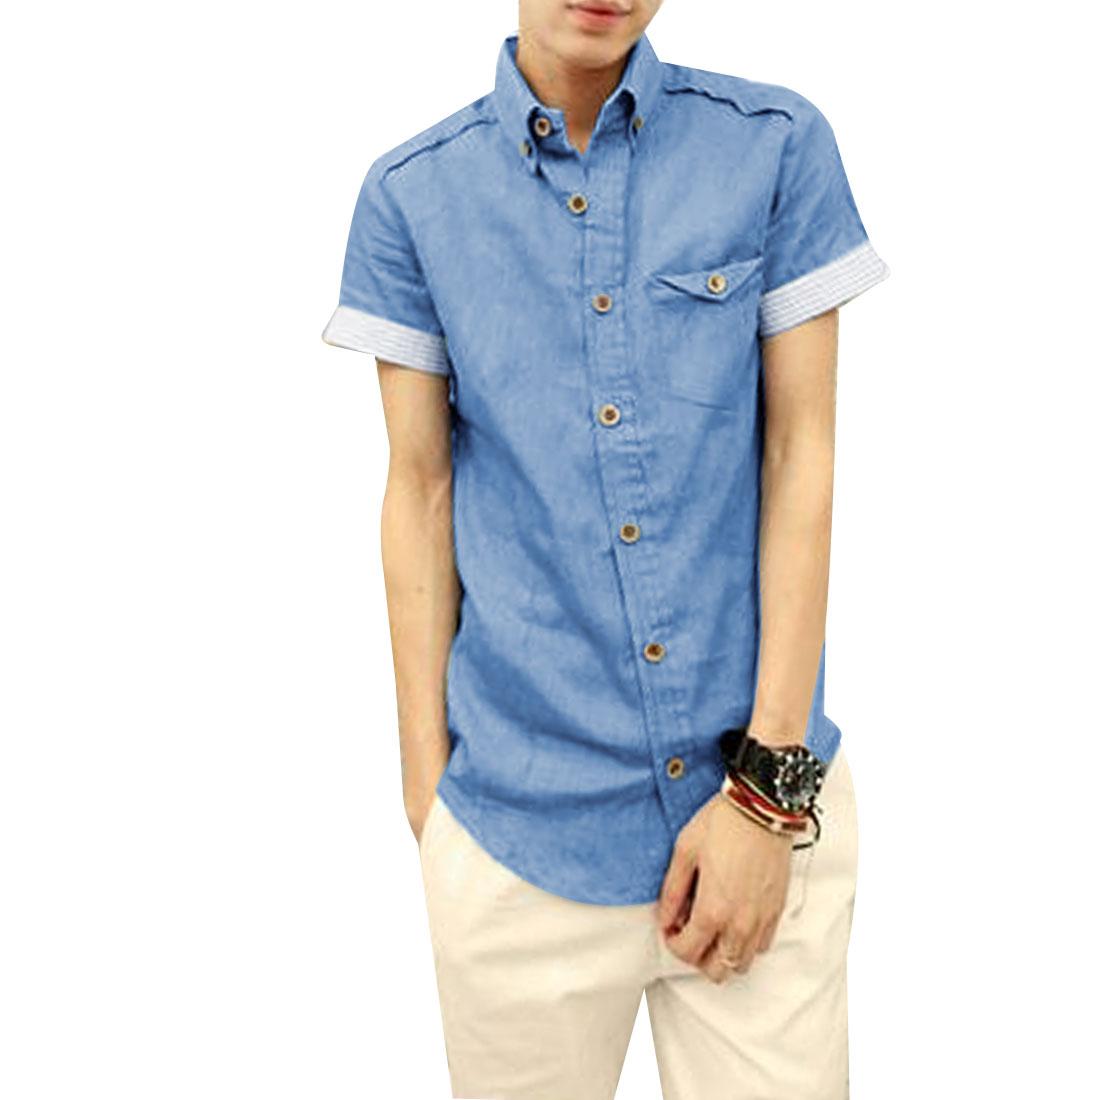 Men Single Breasted Front Stripes Pattern Cuff Demin Blue Shirt M